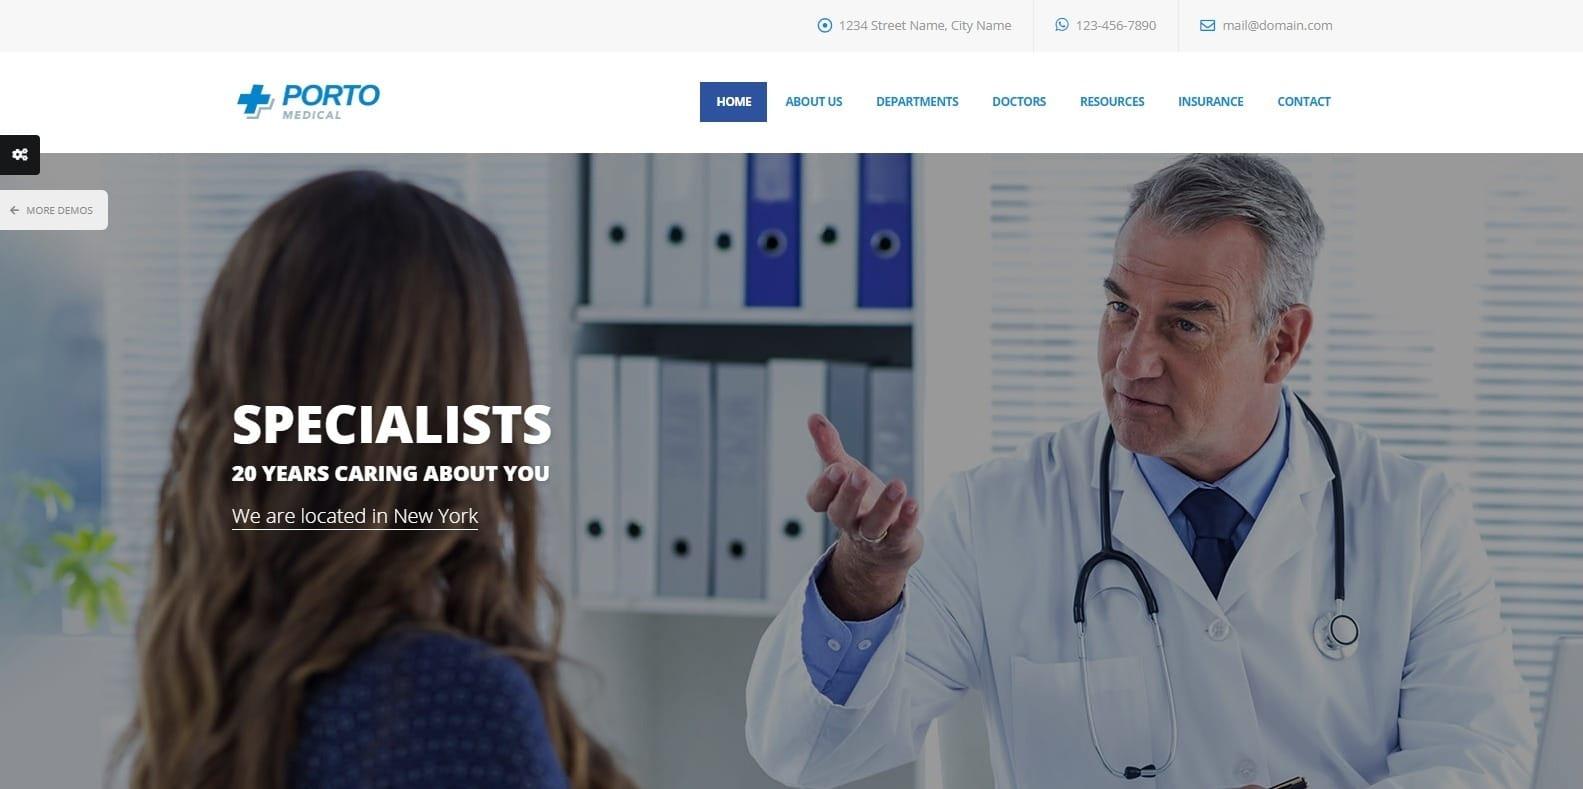 porto-medical-website-template